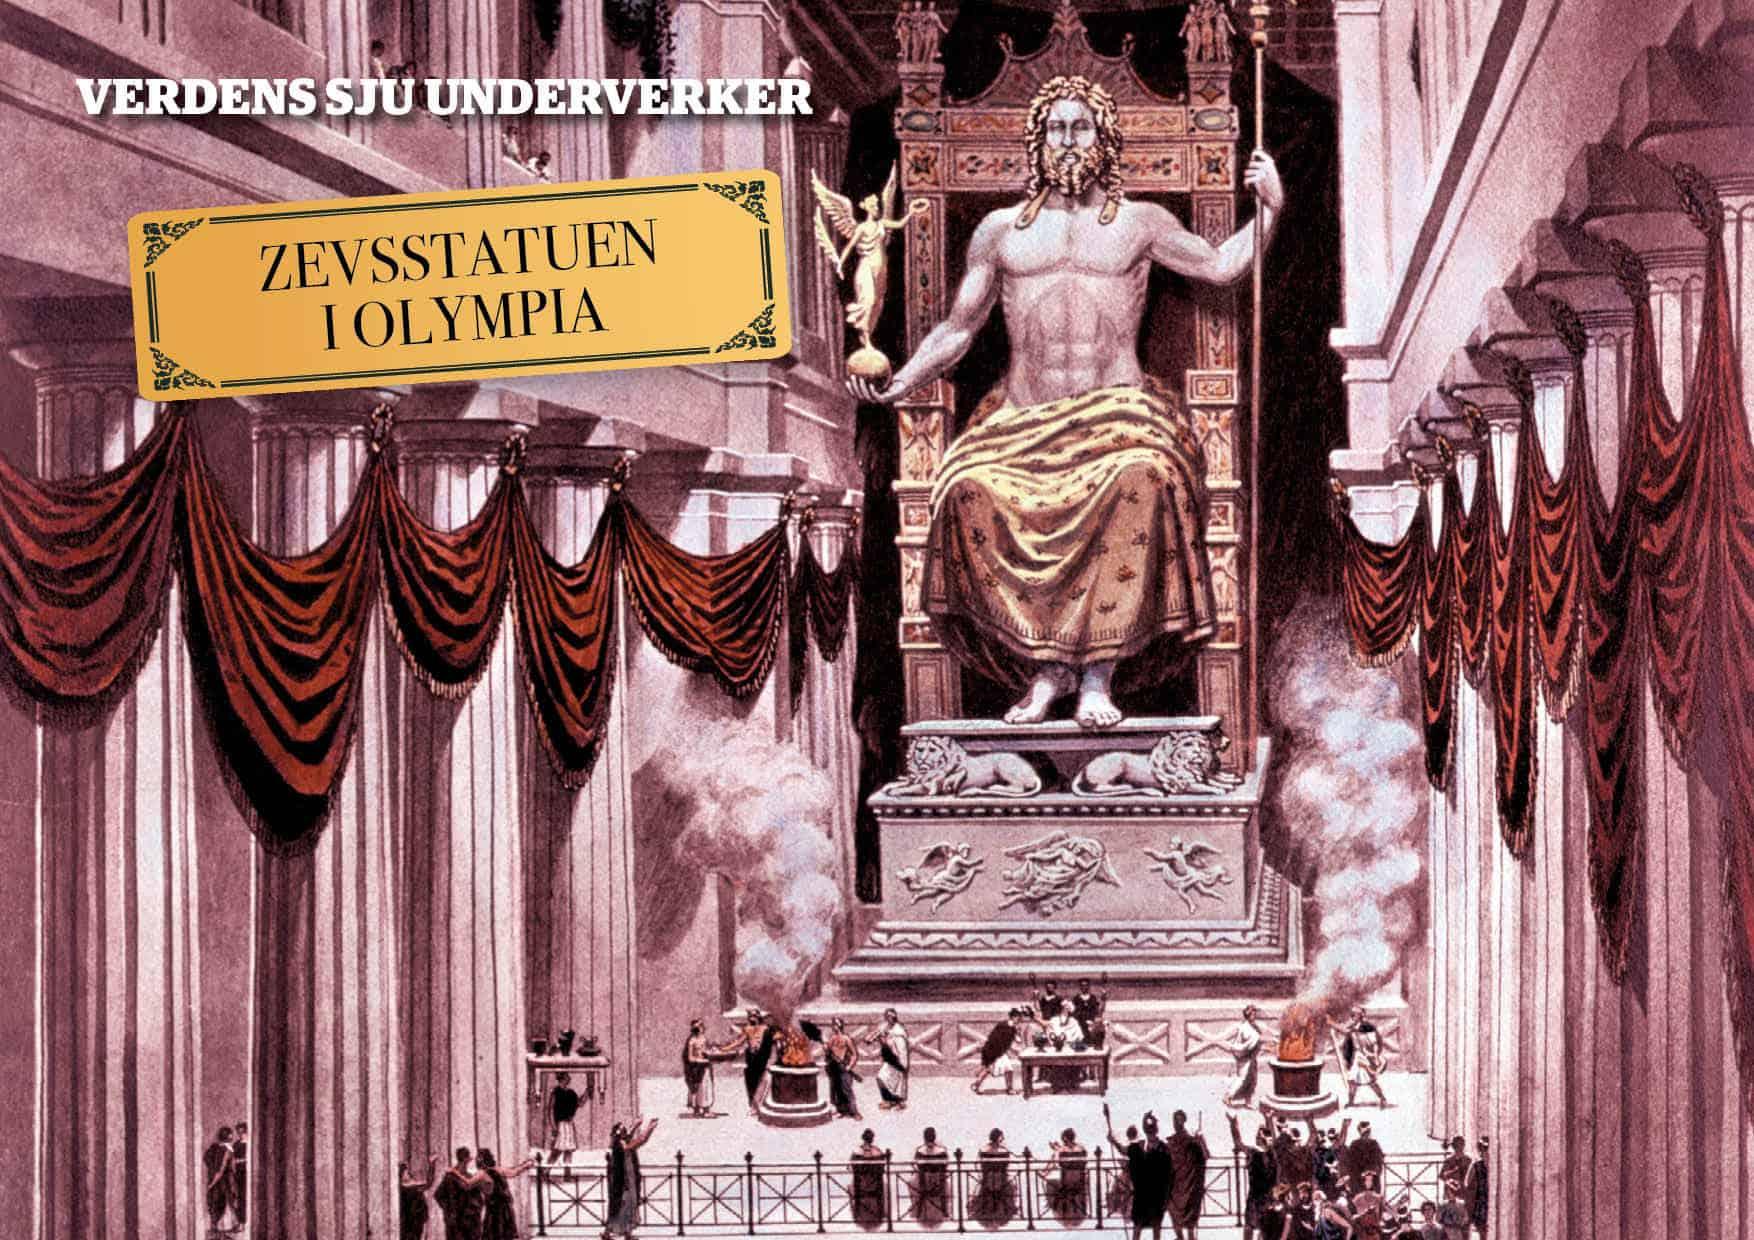 De sju underverker: Zevsstatuen i Olympia